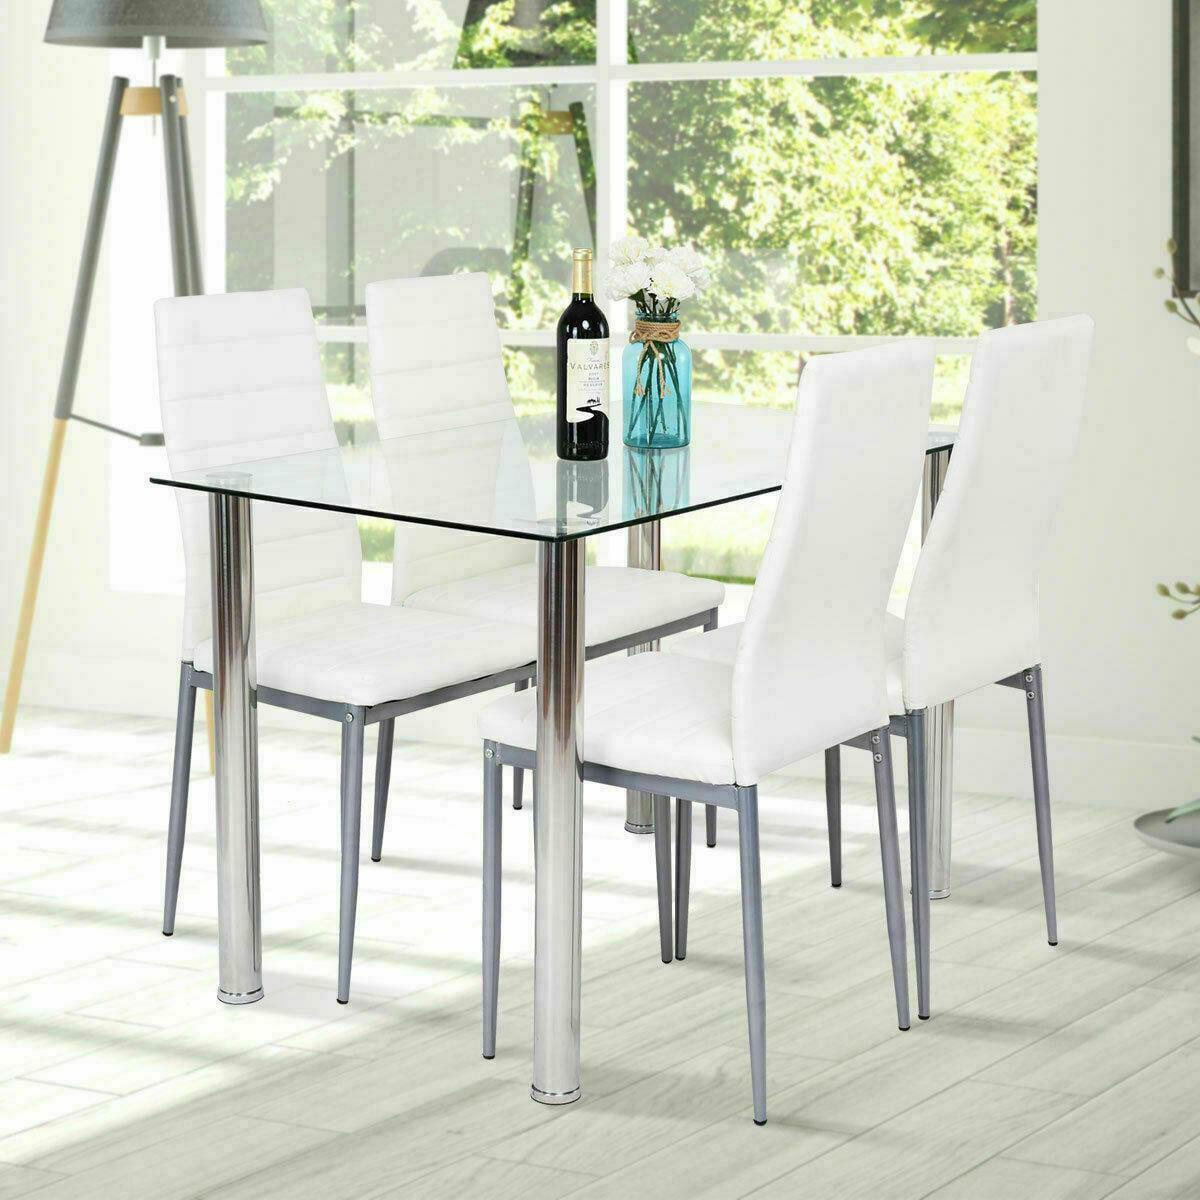 5 Piece Dining Table Set 4 Chairs White Glass Metal Kitchen Furniture Walmart Com Walmart Com